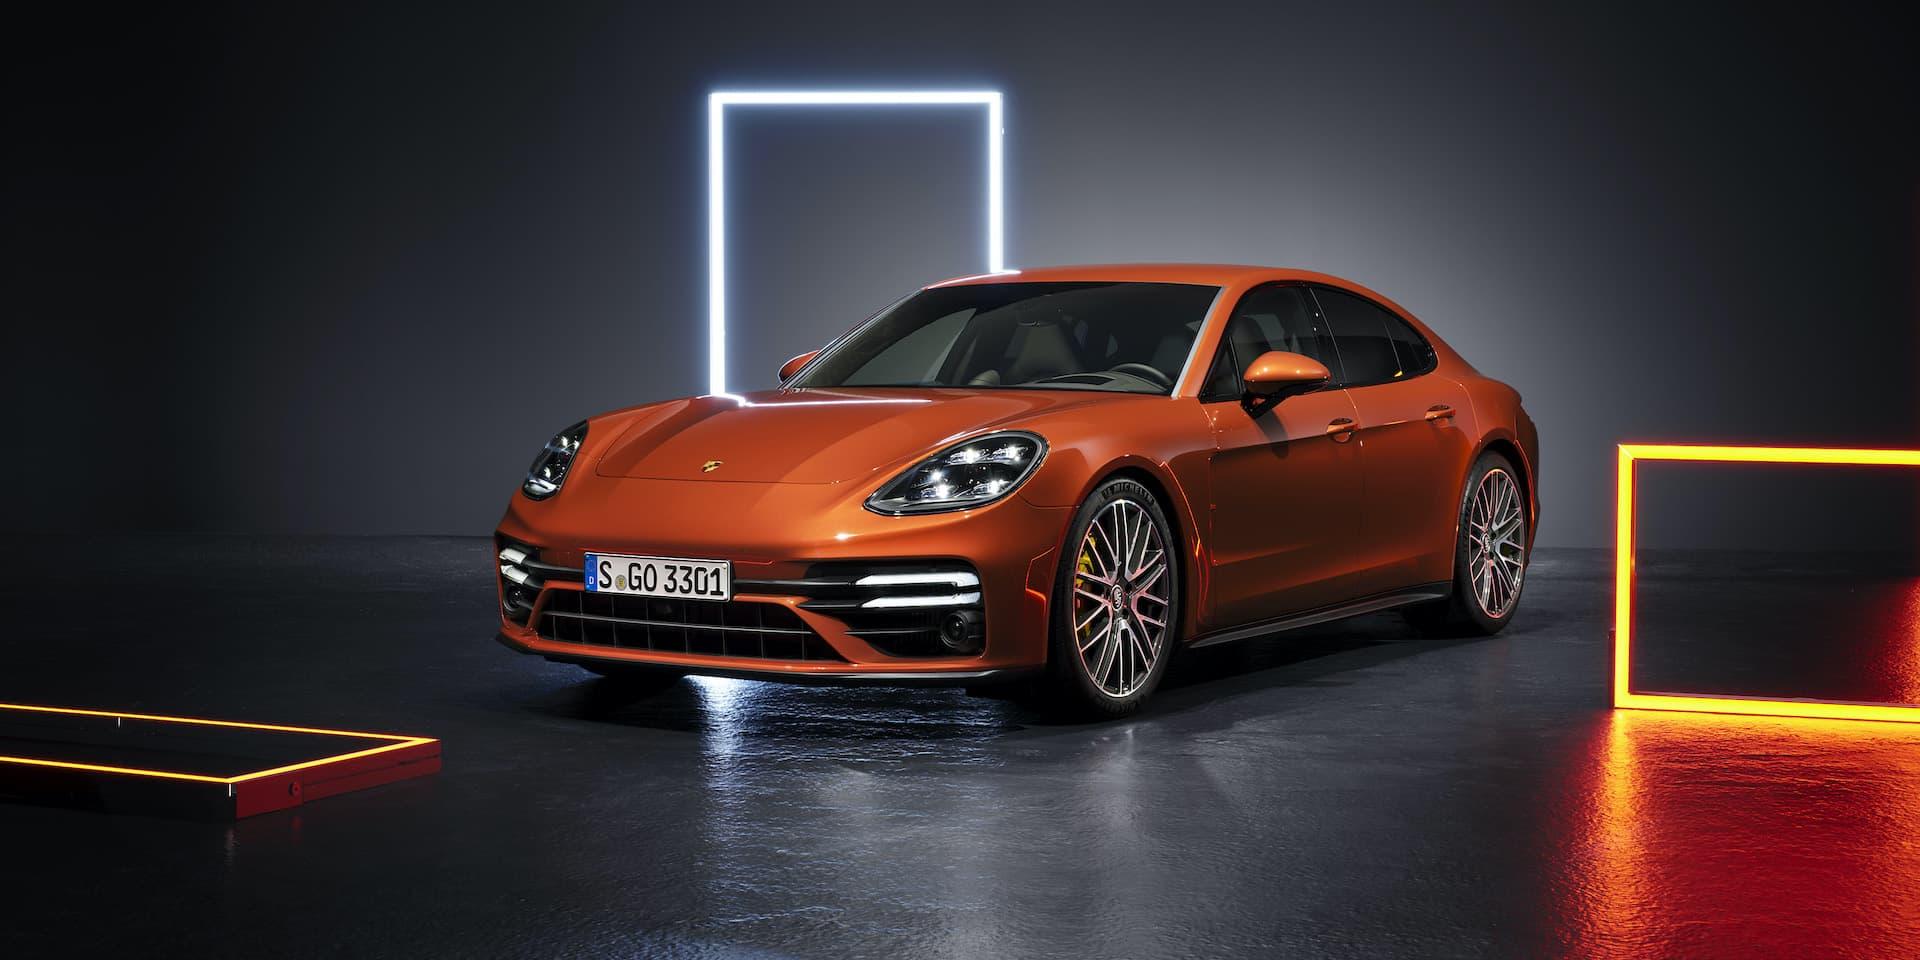 2020 Porsche Panamera saloon